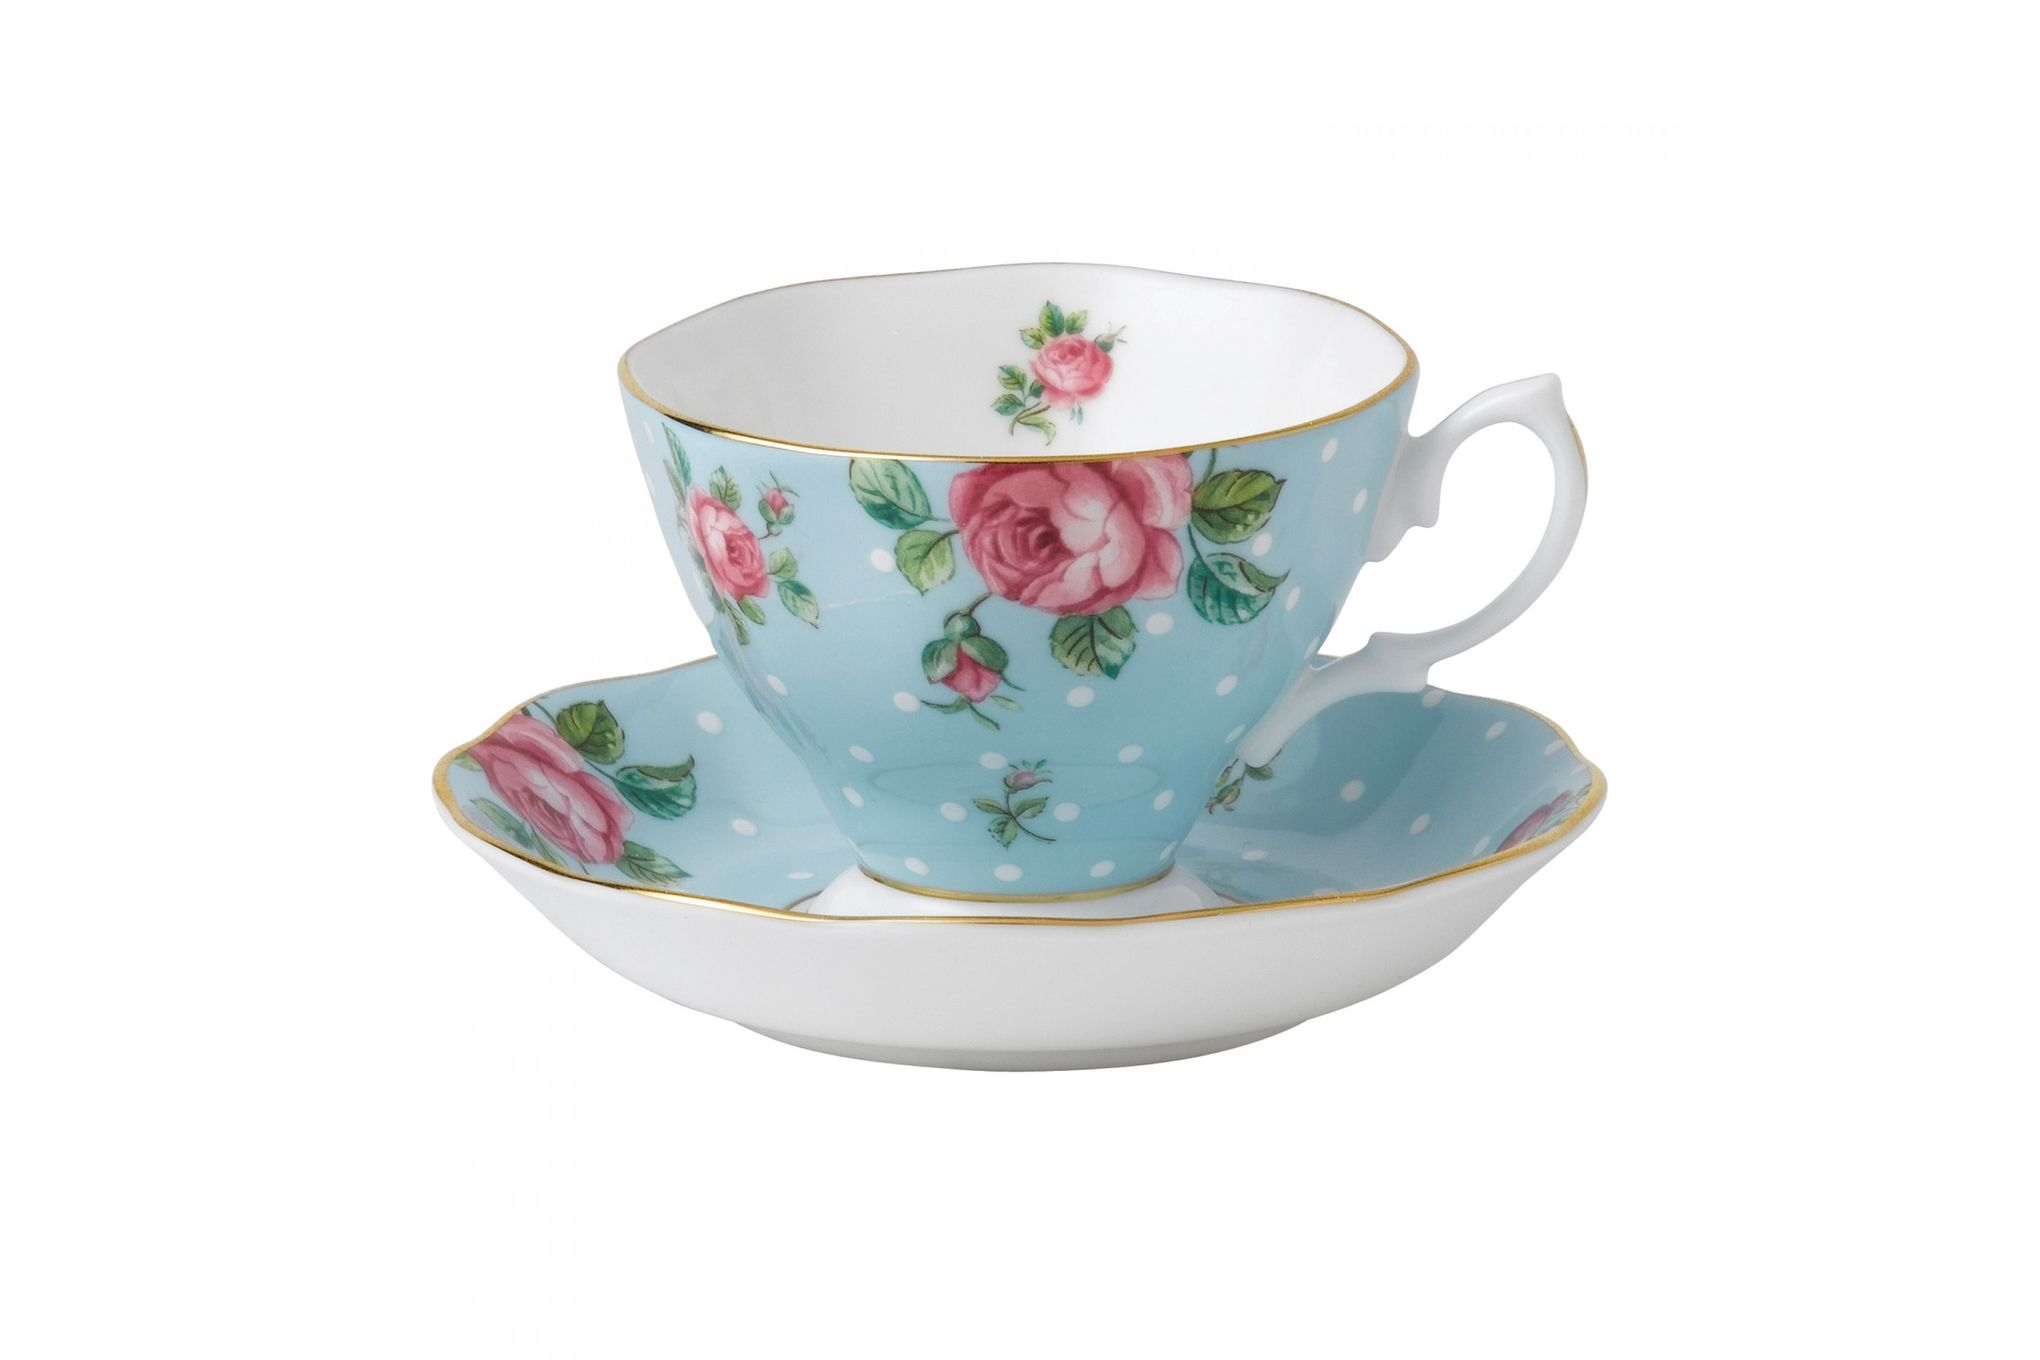 Royal Albert Polka Blue Teacup & Saucer Boxed thumb 1